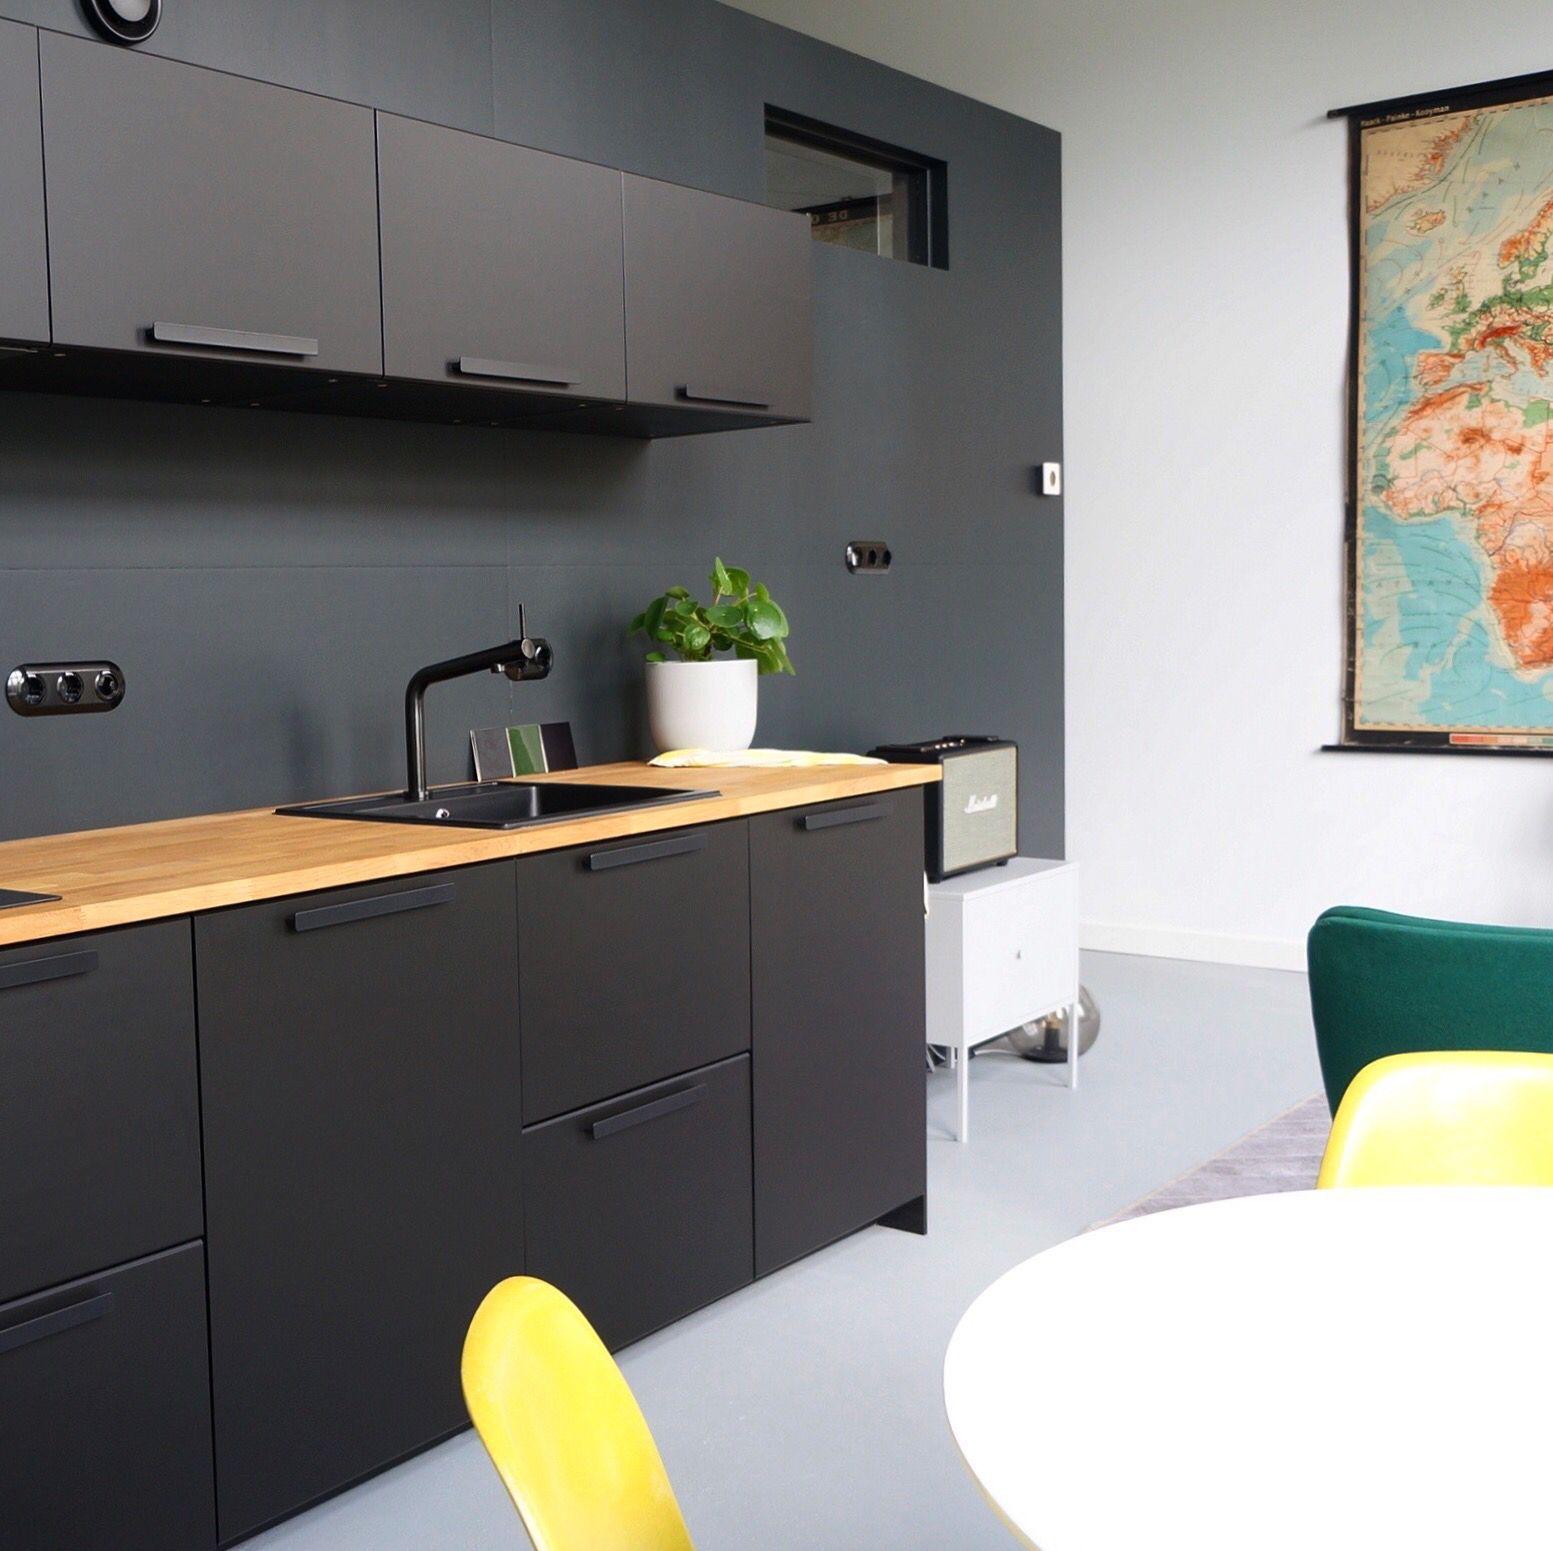 Ikea Kungsbacka Kitchen Interieurontwerp Keuken Ikea Keuken Keuken